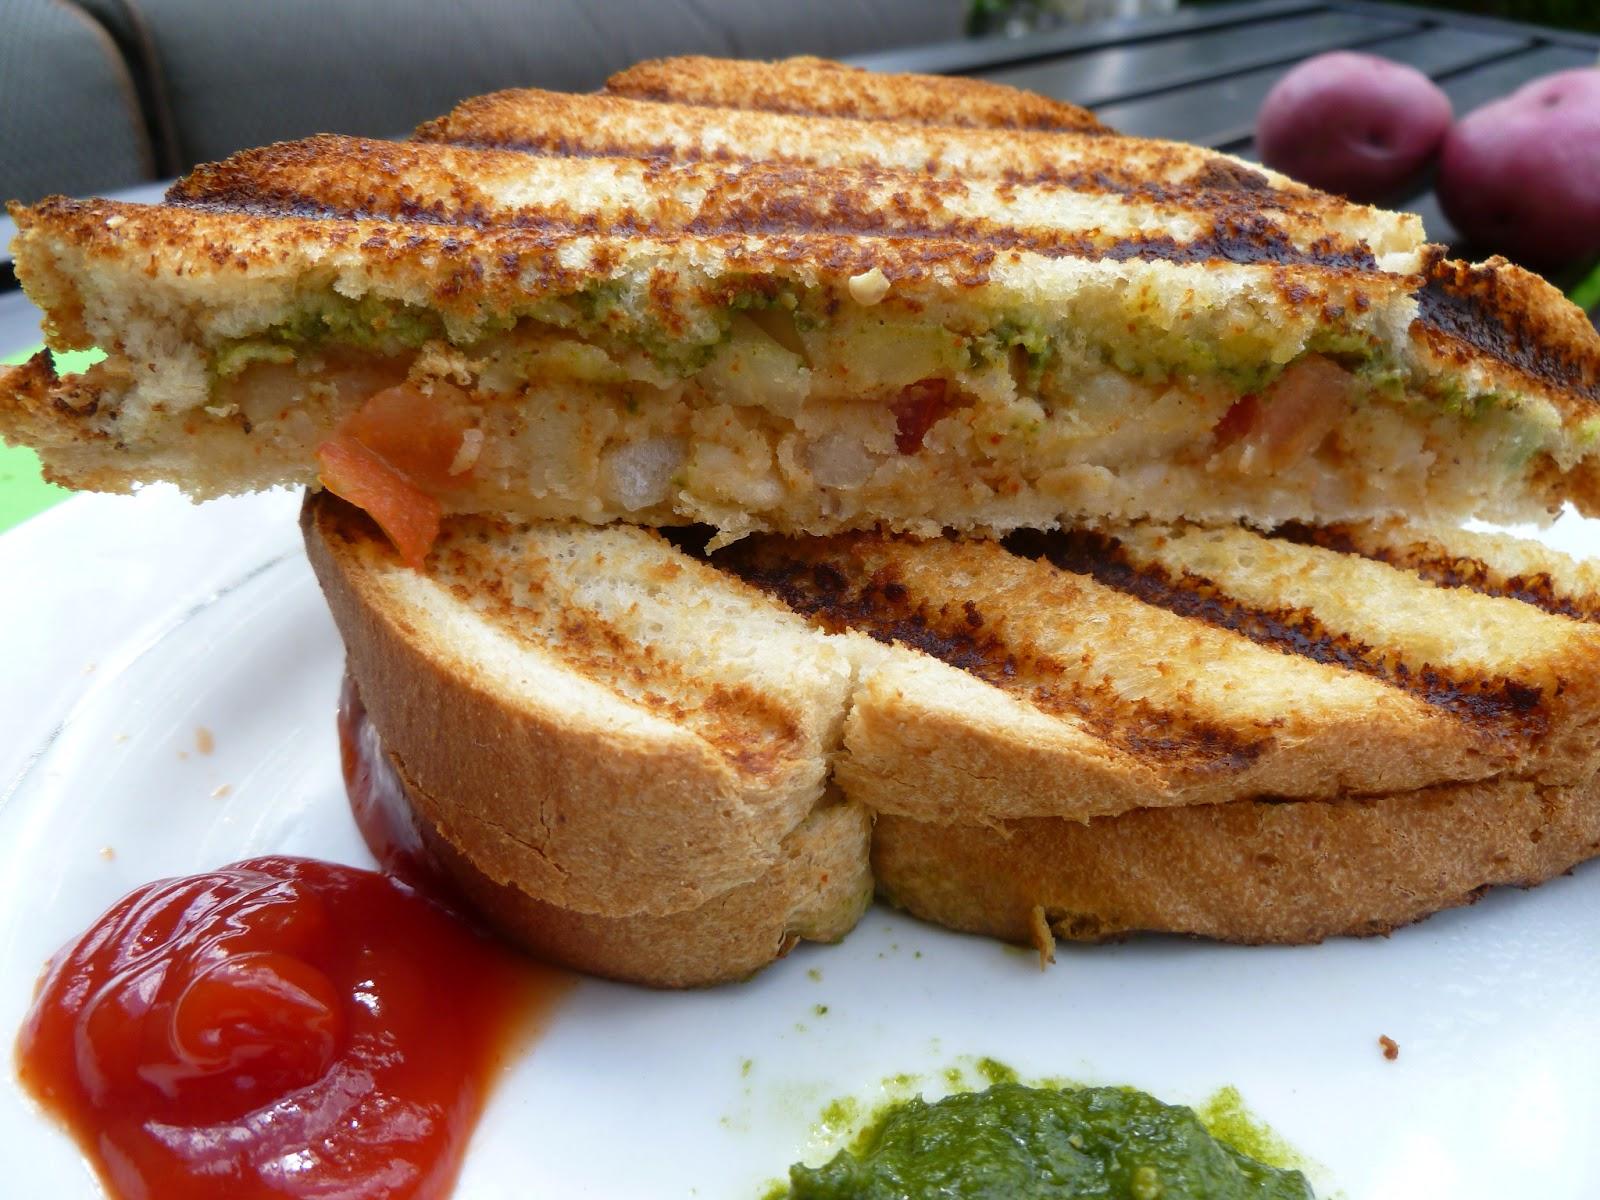 http://2.bp.blogspot.com/-rwpaV24HXCs/T9p_oSmOhEI/AAAAAAAAA5o/y8KhvgpgqI4/s1600/Quick%2BAloo%2BSandwich.jpg